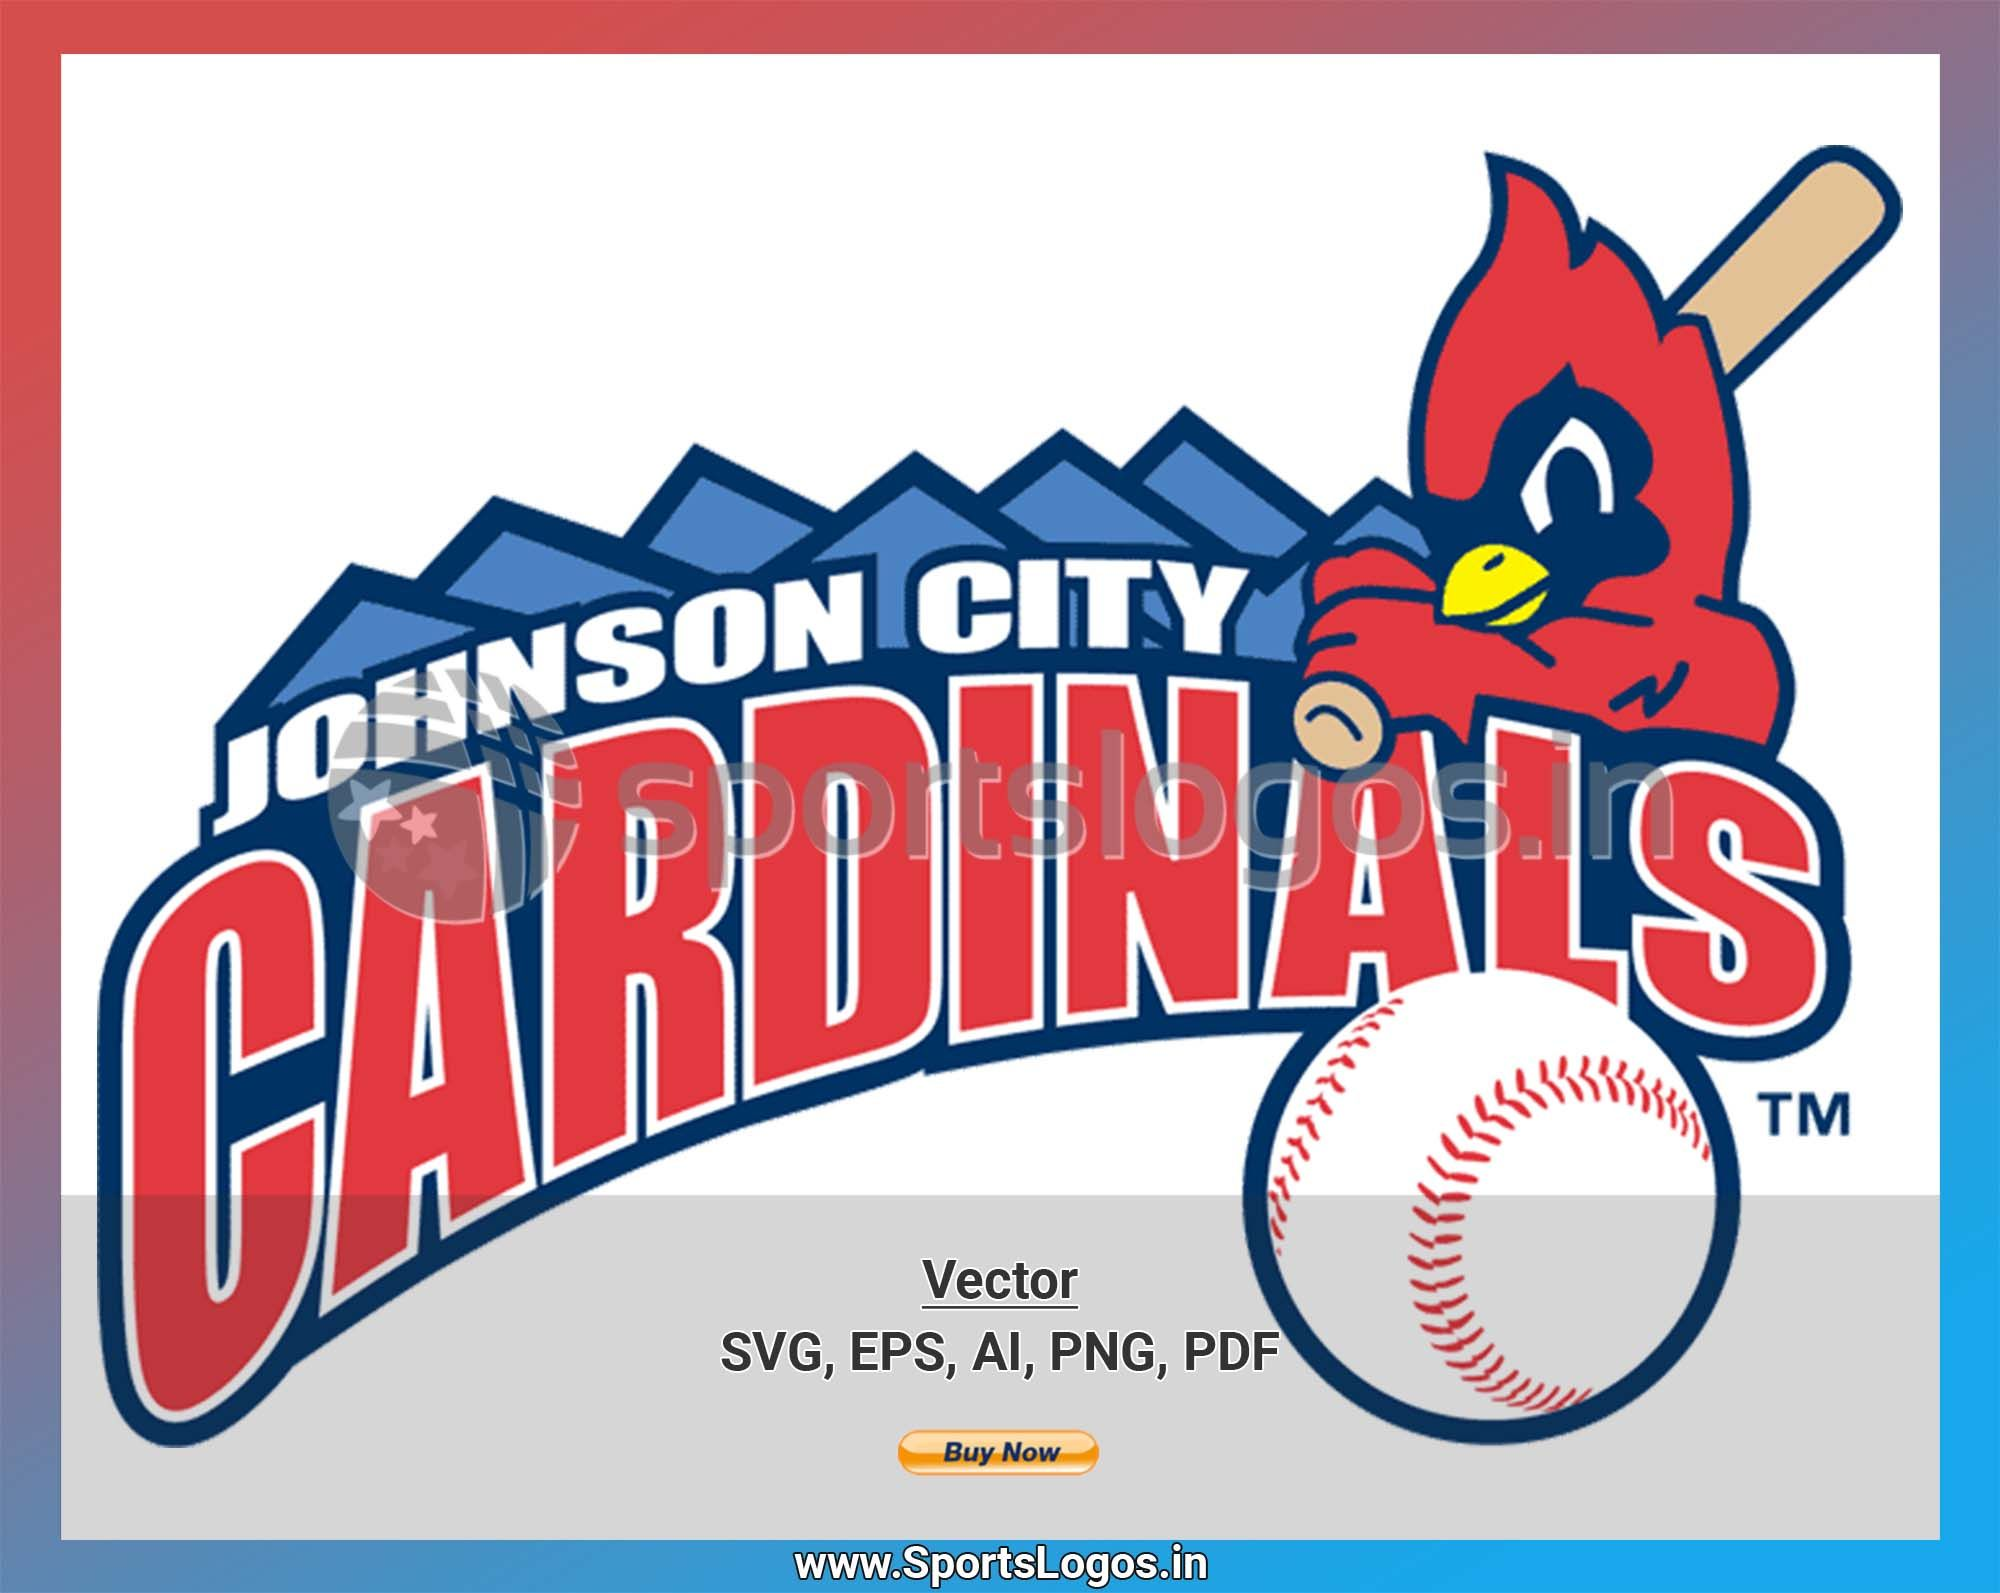 Johnson City Cardinals 1995, Appalachian League